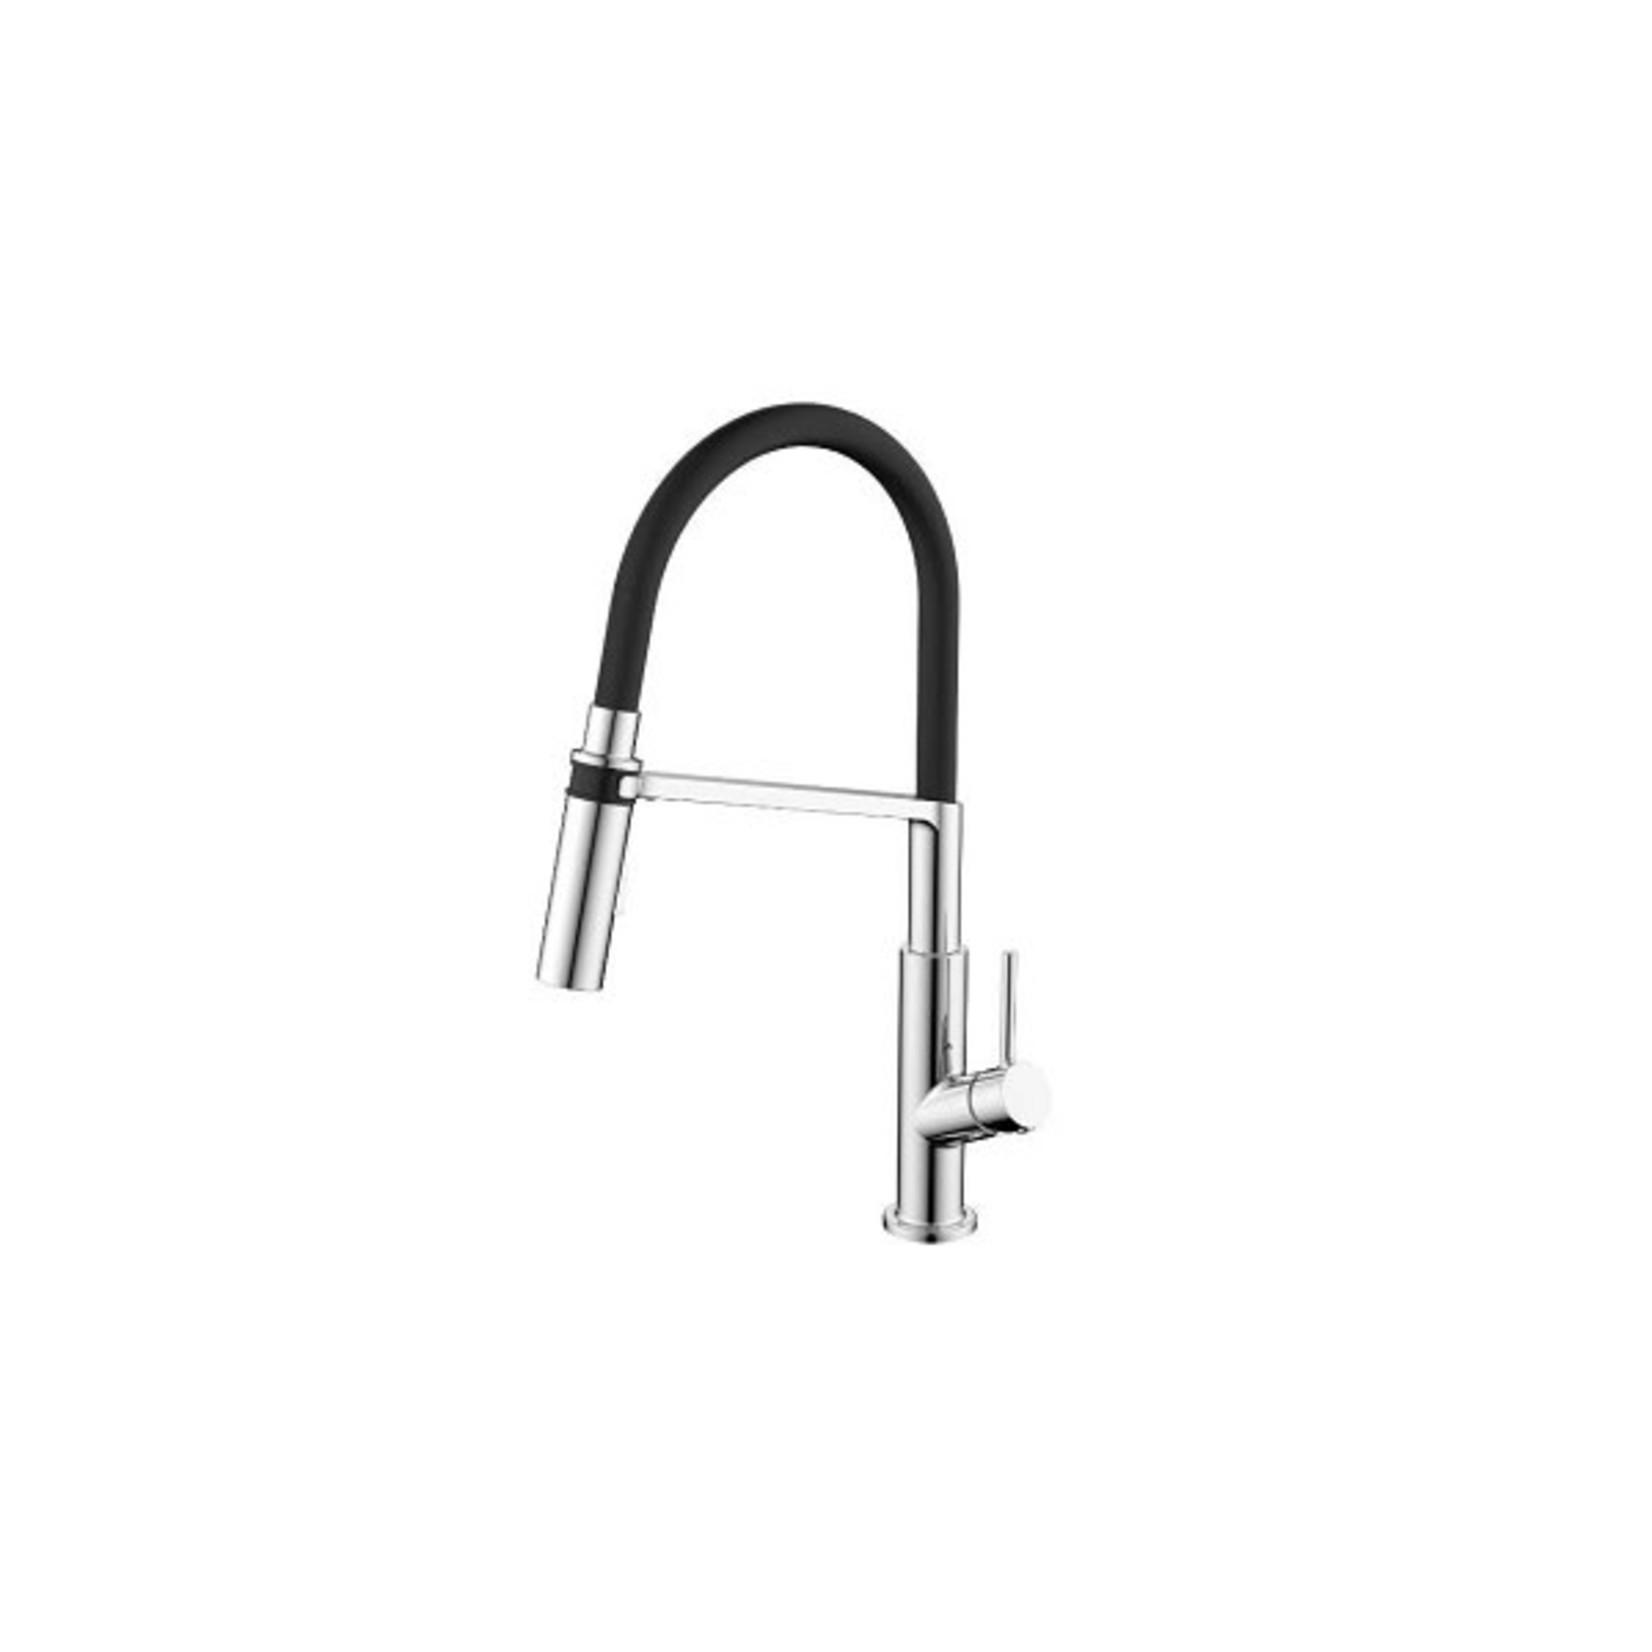 Kitchen Faucet with Magnet 6810 Chrome / Black